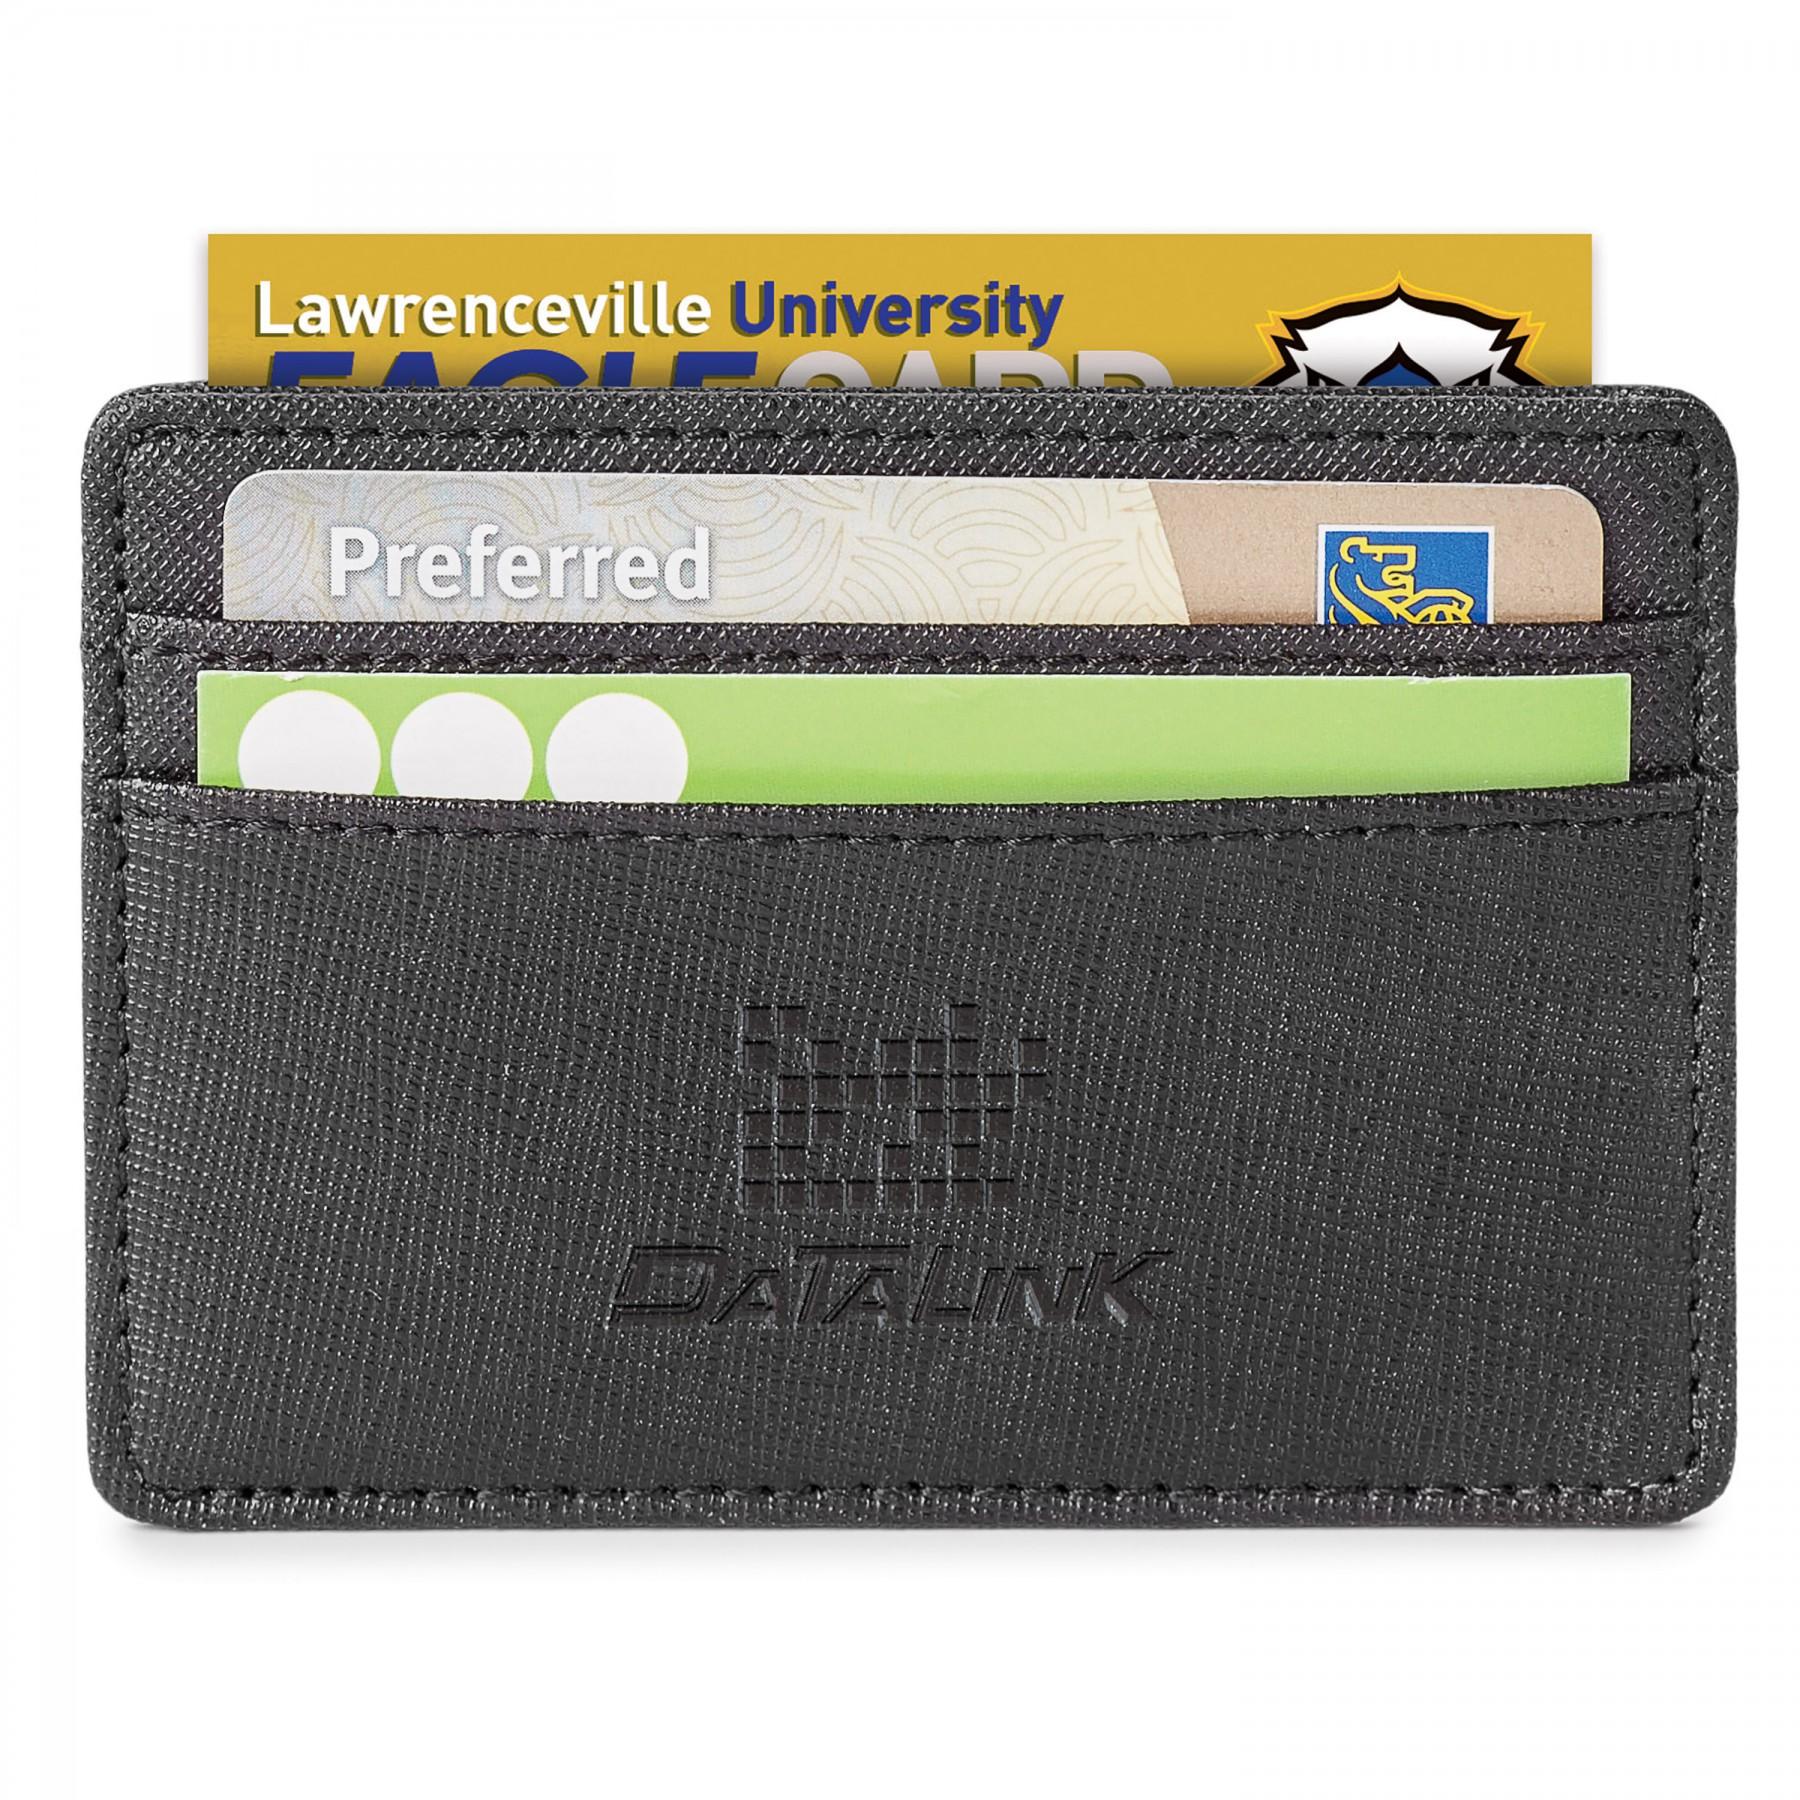 Genuine Leather Rfid Card Holder - Debossed Imprint (ST148)